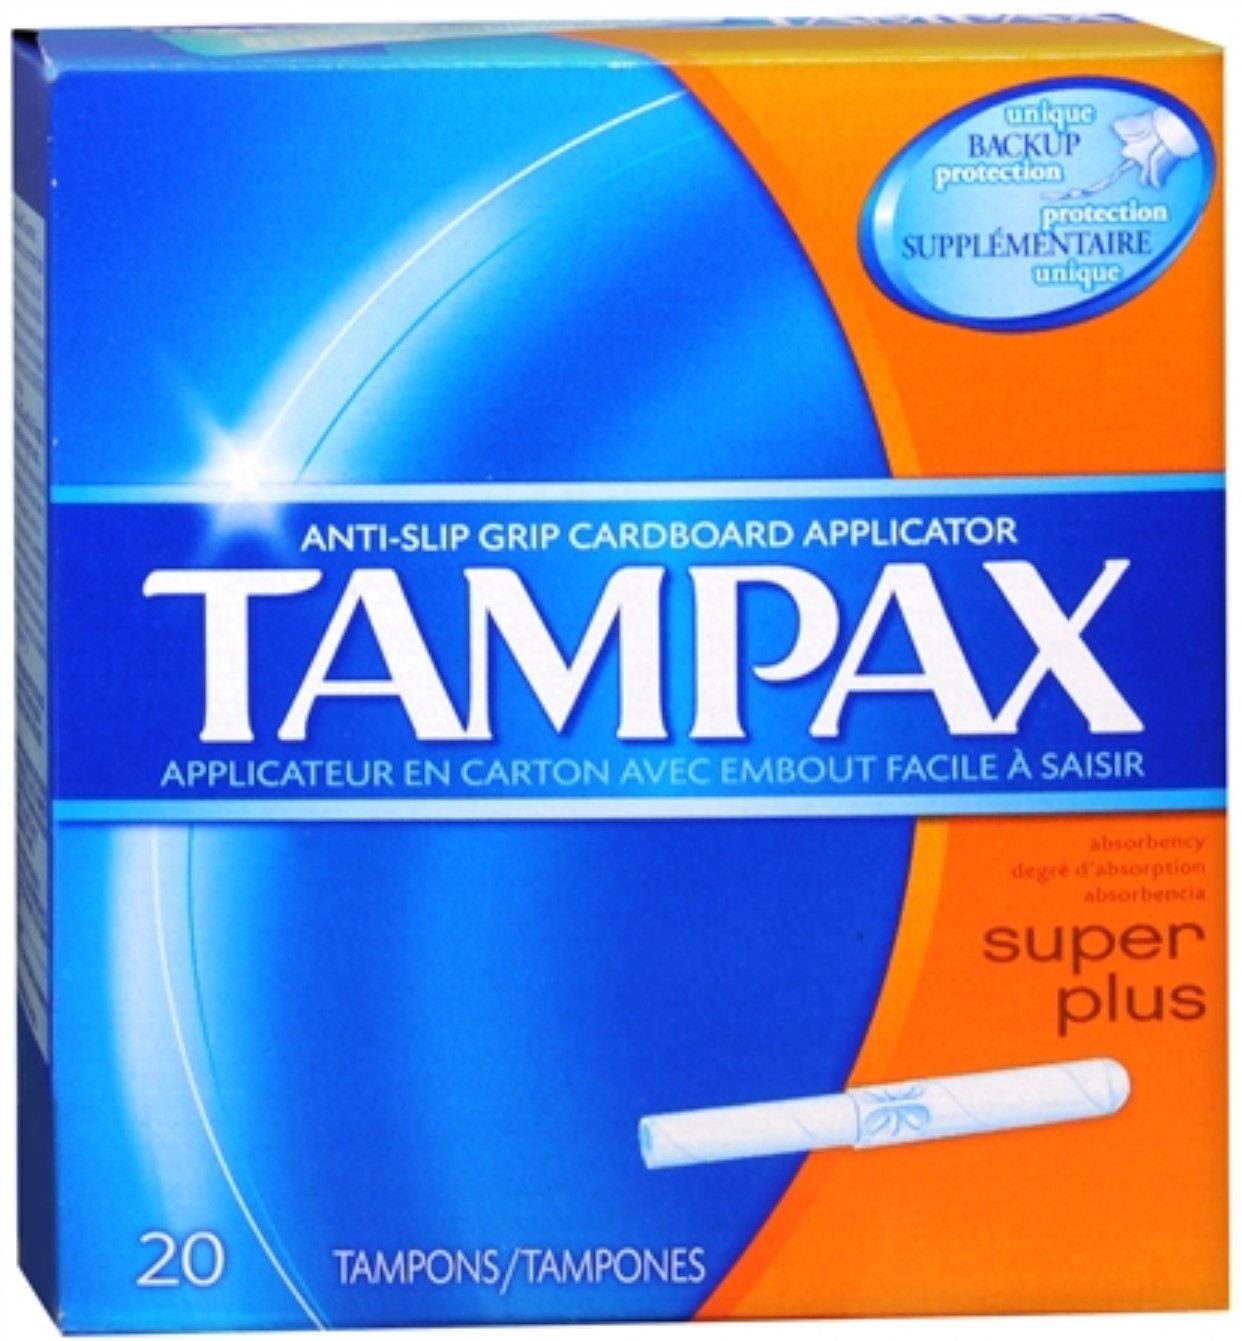 6 Pack - Tampax Tampons Super Plus 20 Each